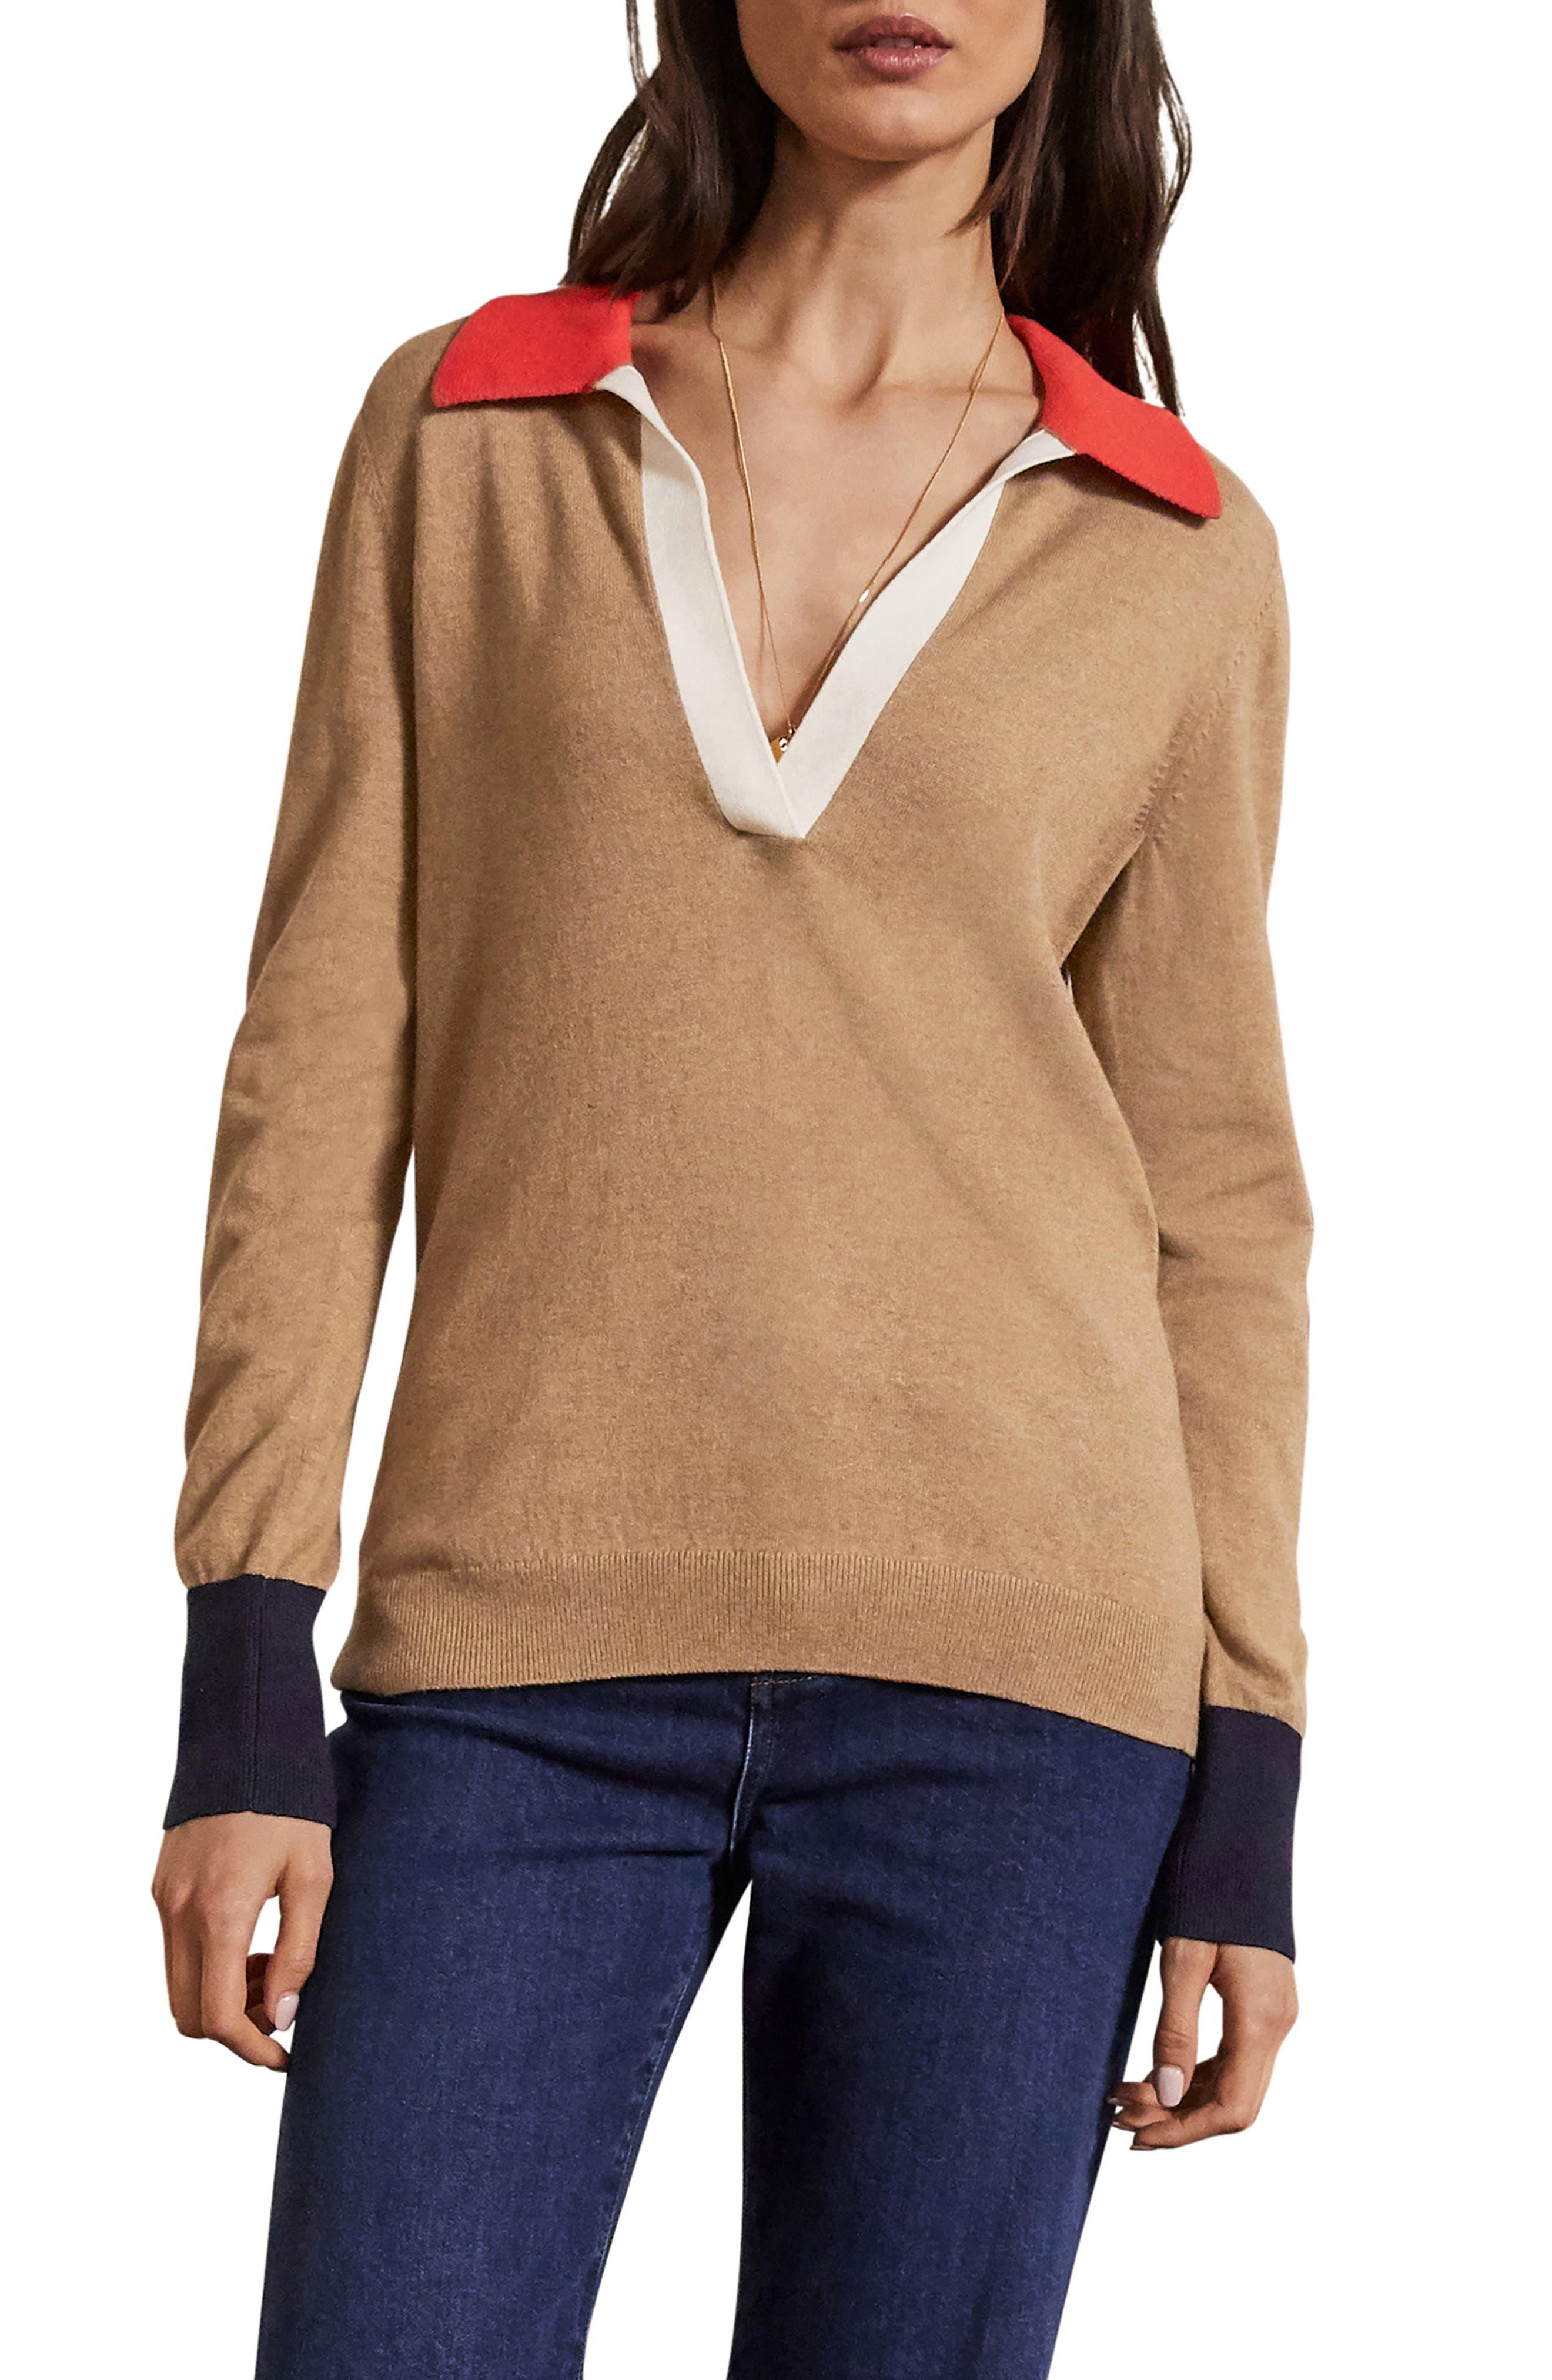 Plus Size Women's Boden Collar Sweater